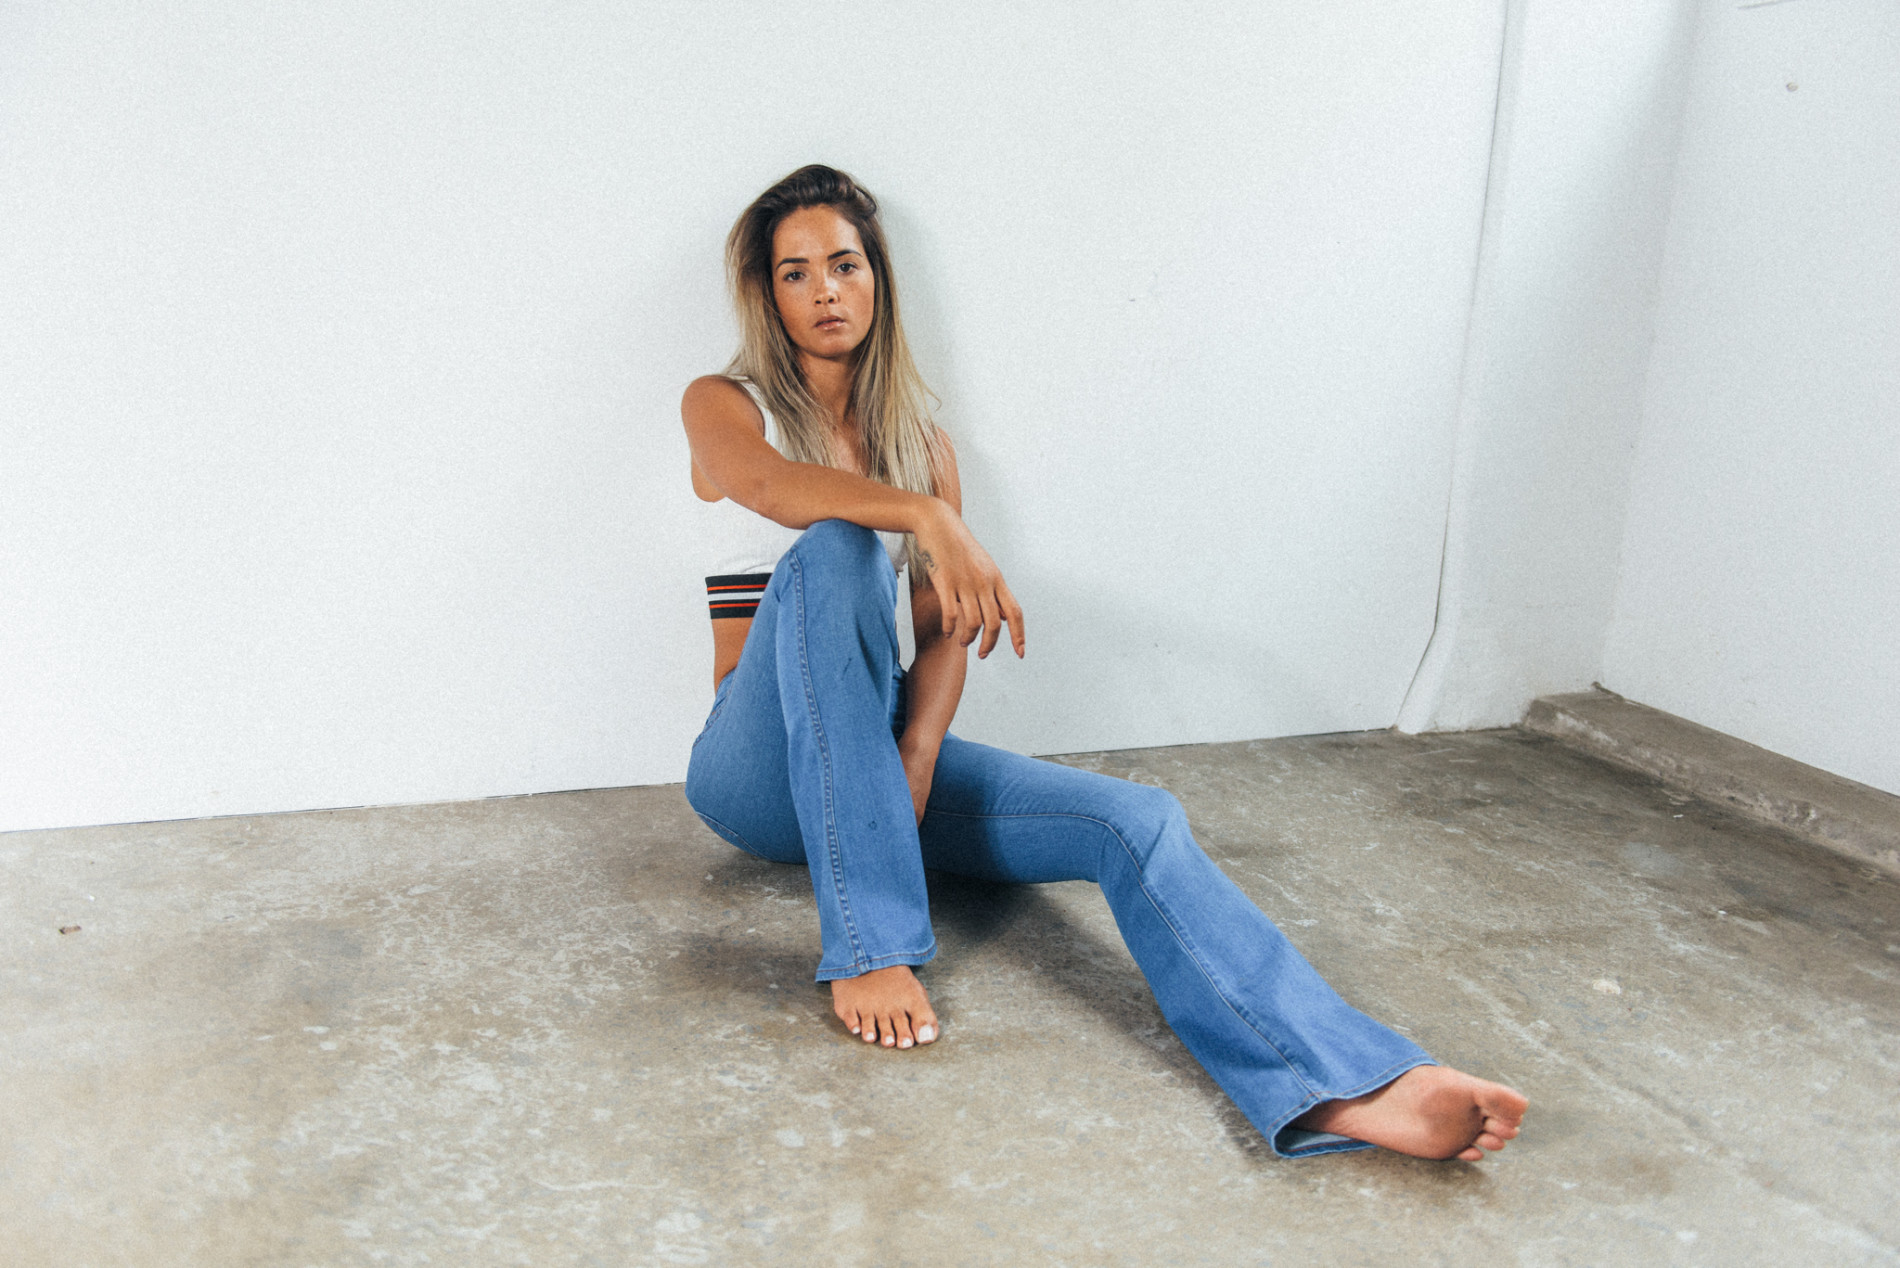 Fotos Aisha Jade nudes (54 foto and video), Sexy, Bikini, Selfie, braless 2017